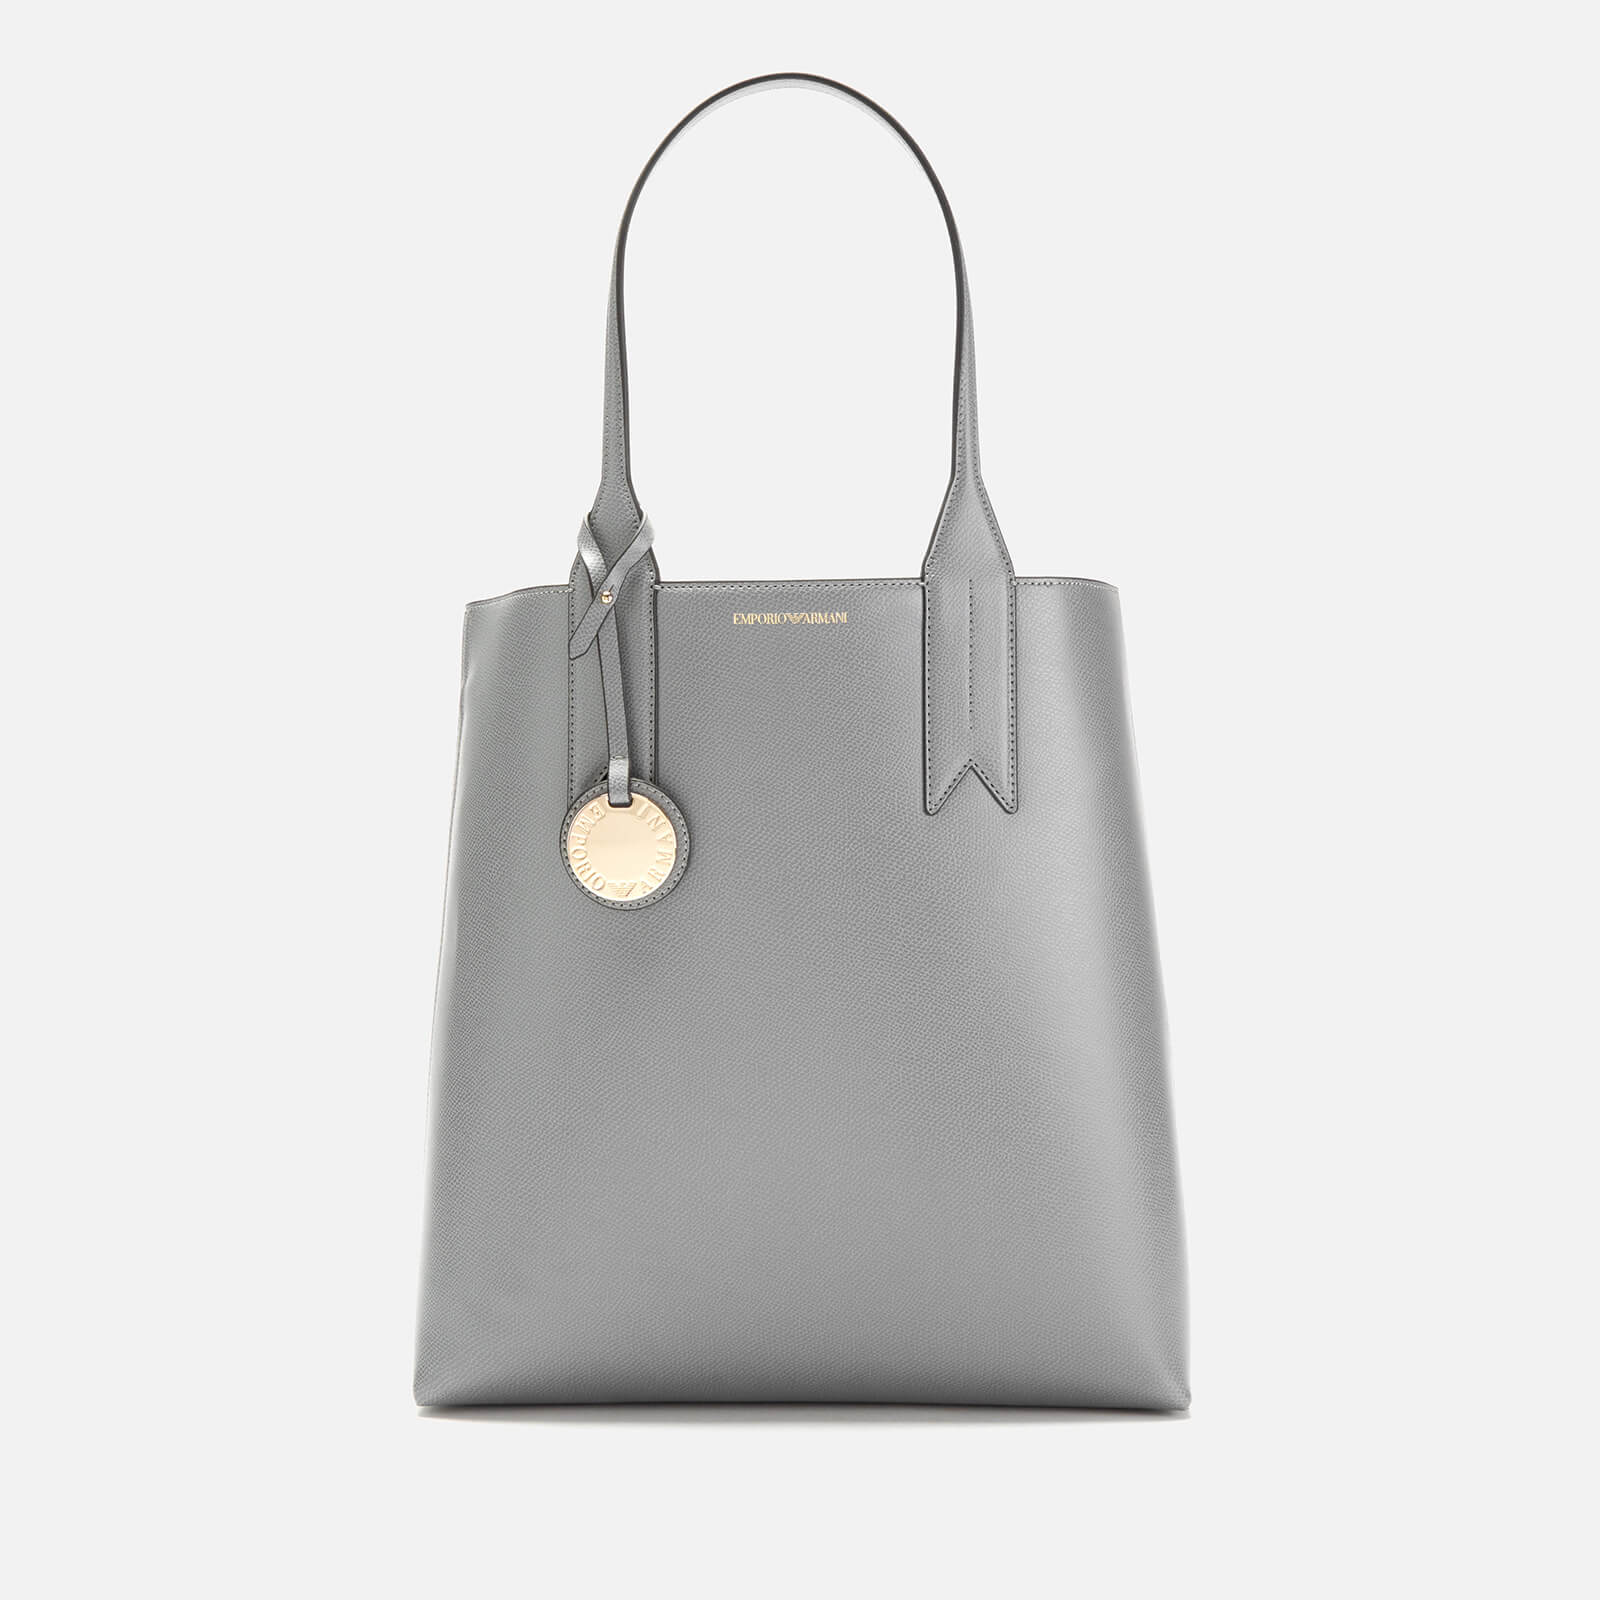 f87144e4e Emporio Armani Women's Shopping Bag - Pietra/Curcuma